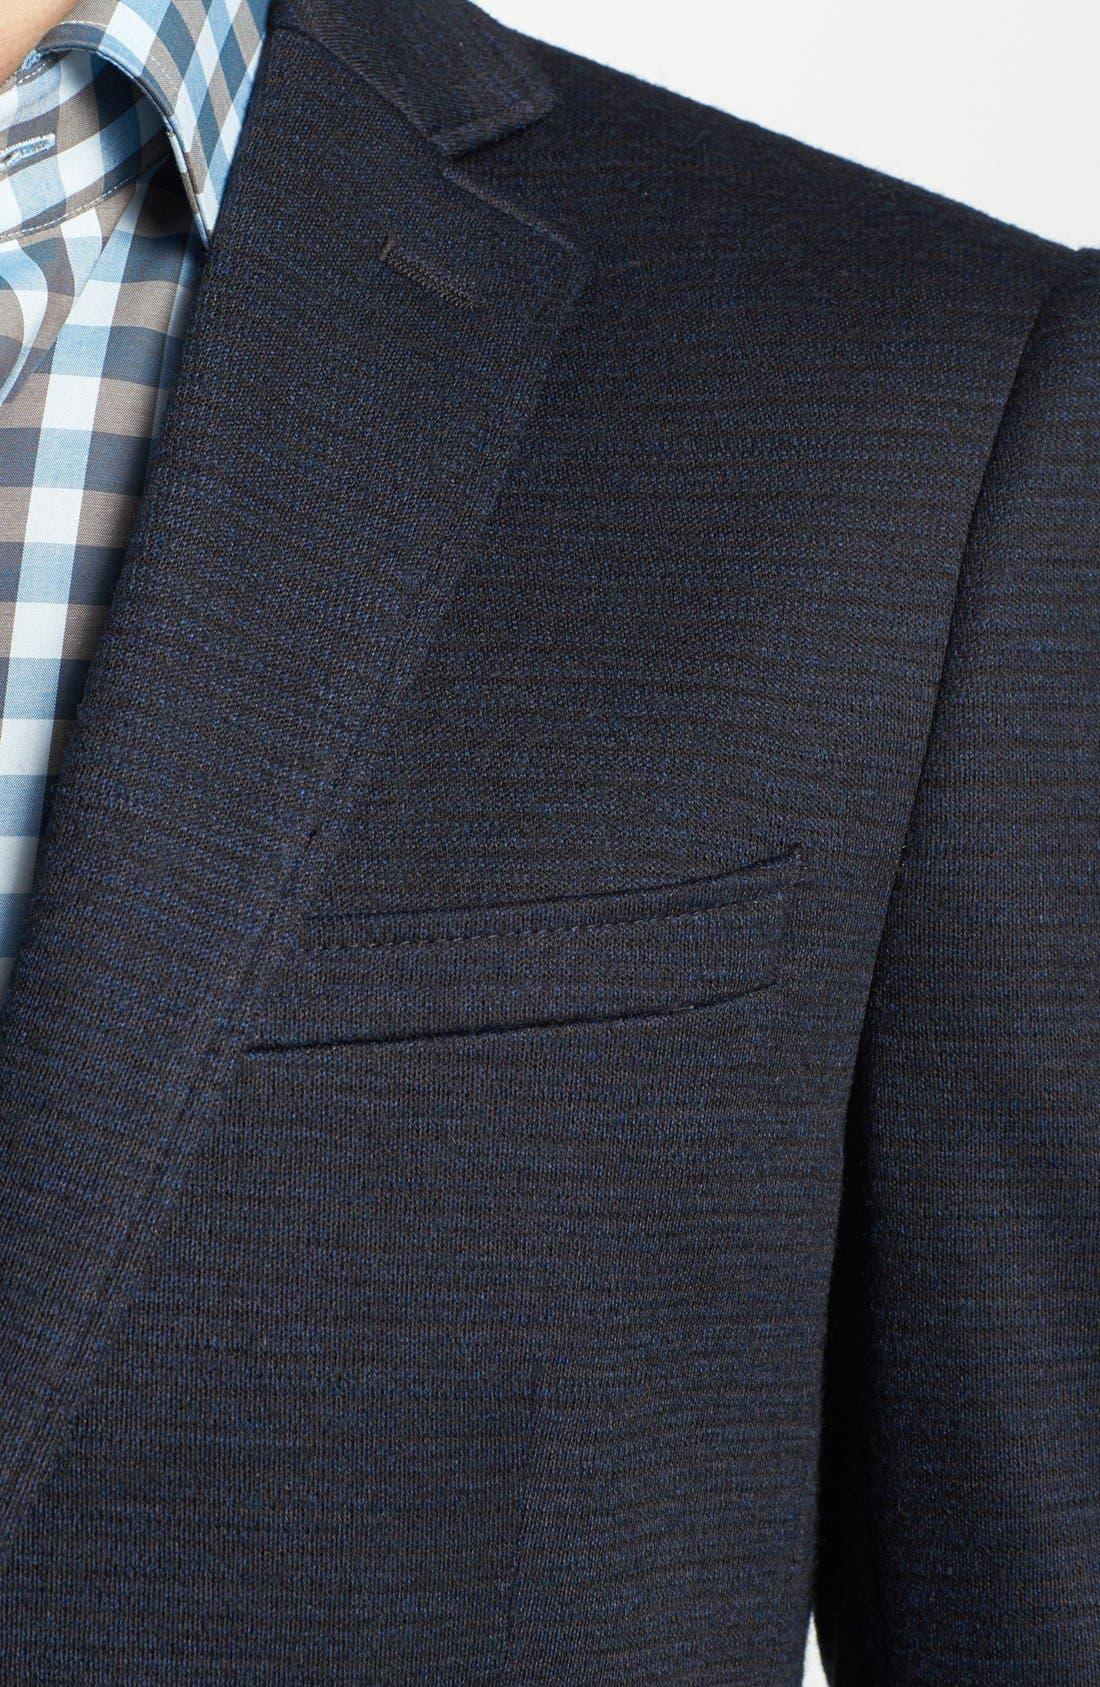 JOHN VARVATOS STAR USA, 'Fagan' Trim Fit Knit Sportcoat, Alternate thumbnail 4, color, 410